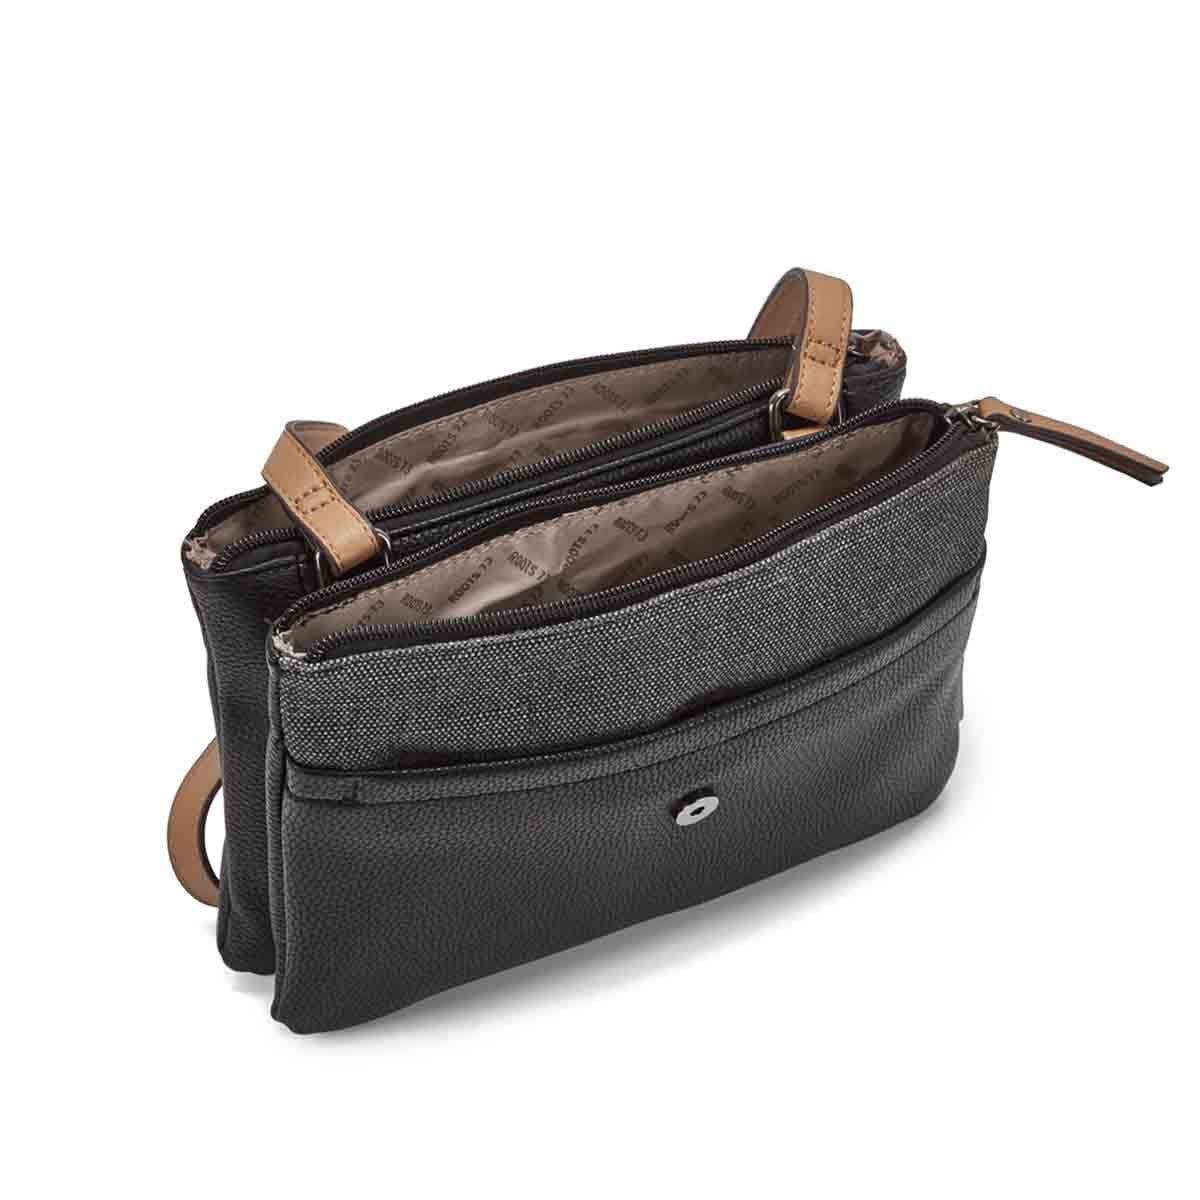 Lds black east/west crossbody bag